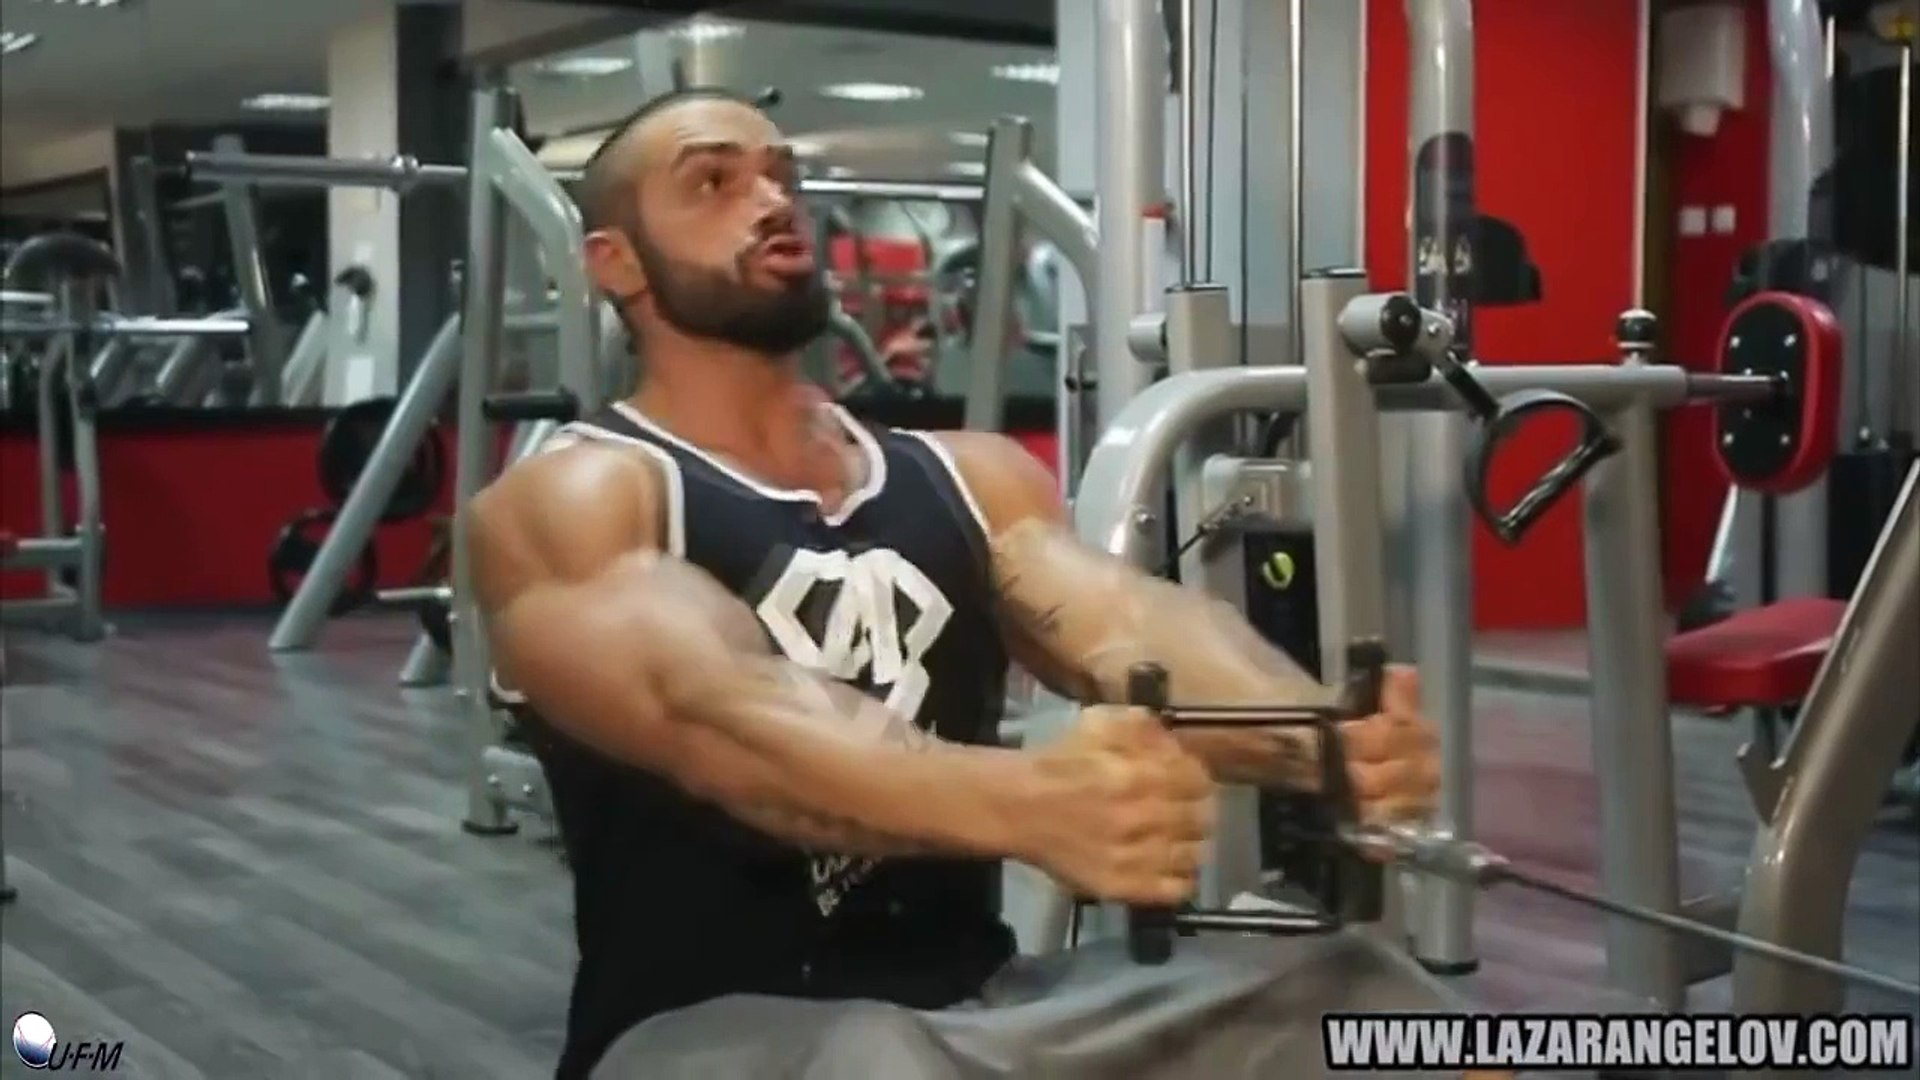 LAZAR ANGELOV Motivation - You Vs You